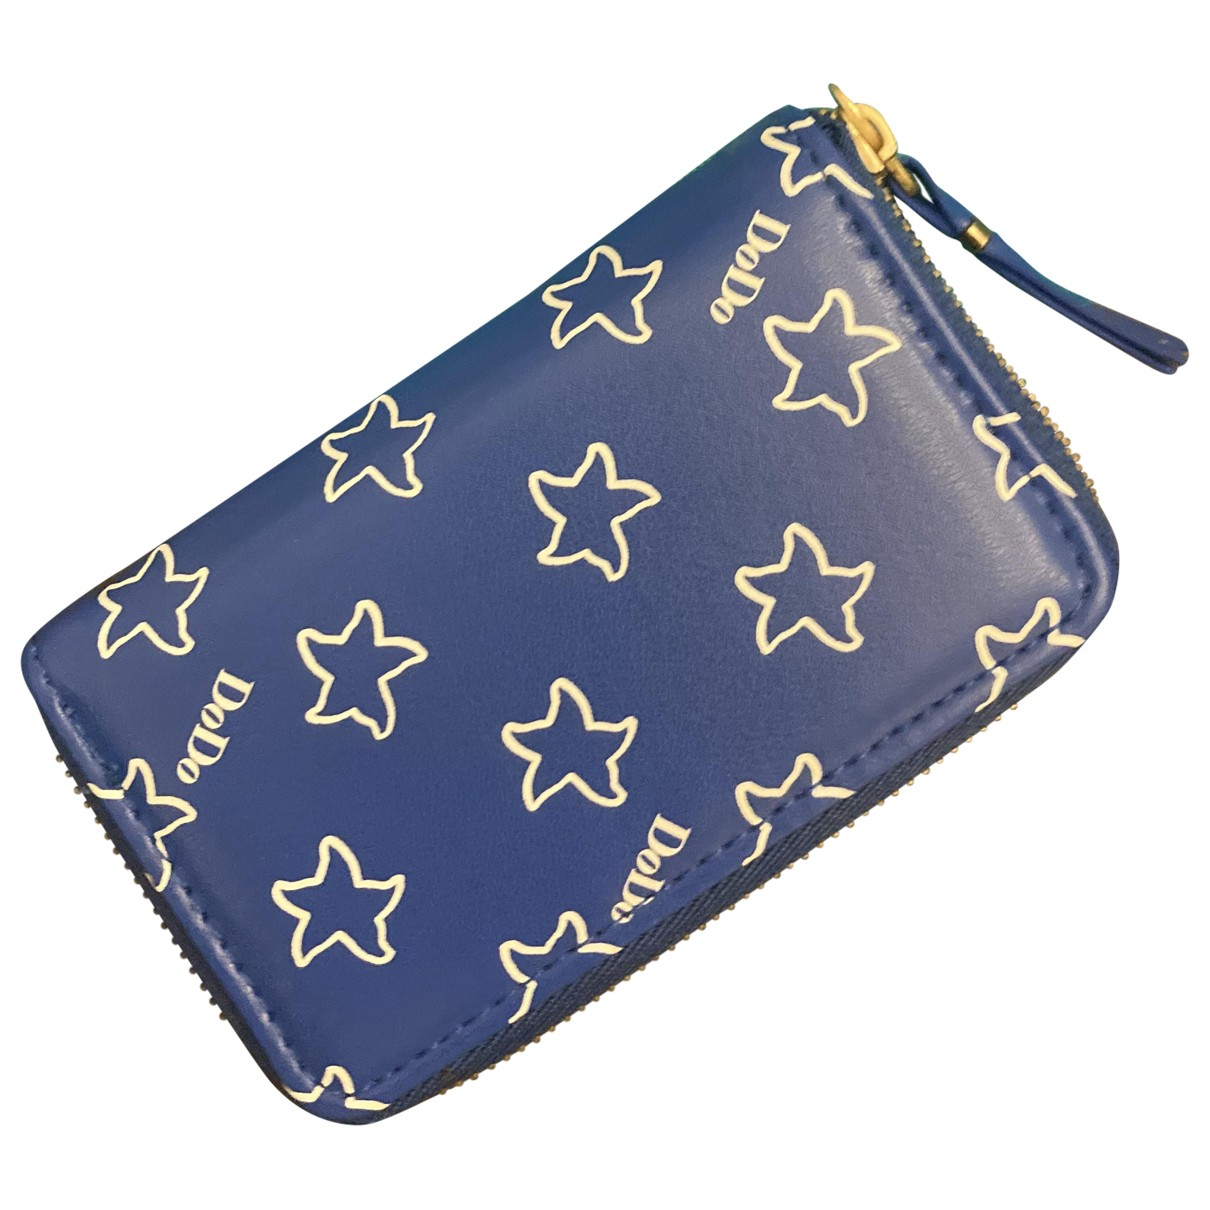 Dodo Pomellato N Blue Leather Purses, wallet & cases for Women N